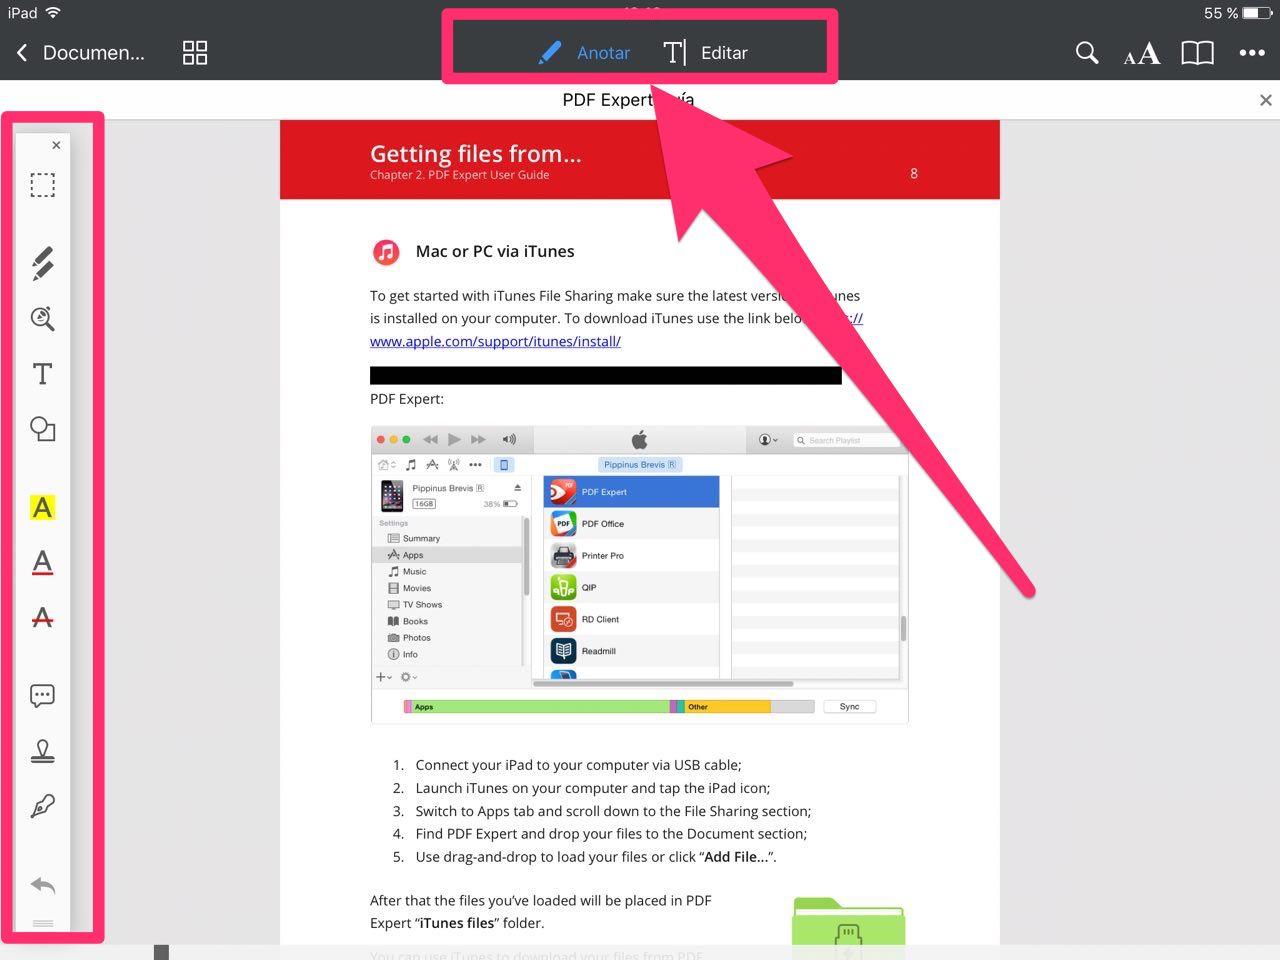 Anotar en PDF Expert 6 para iOS